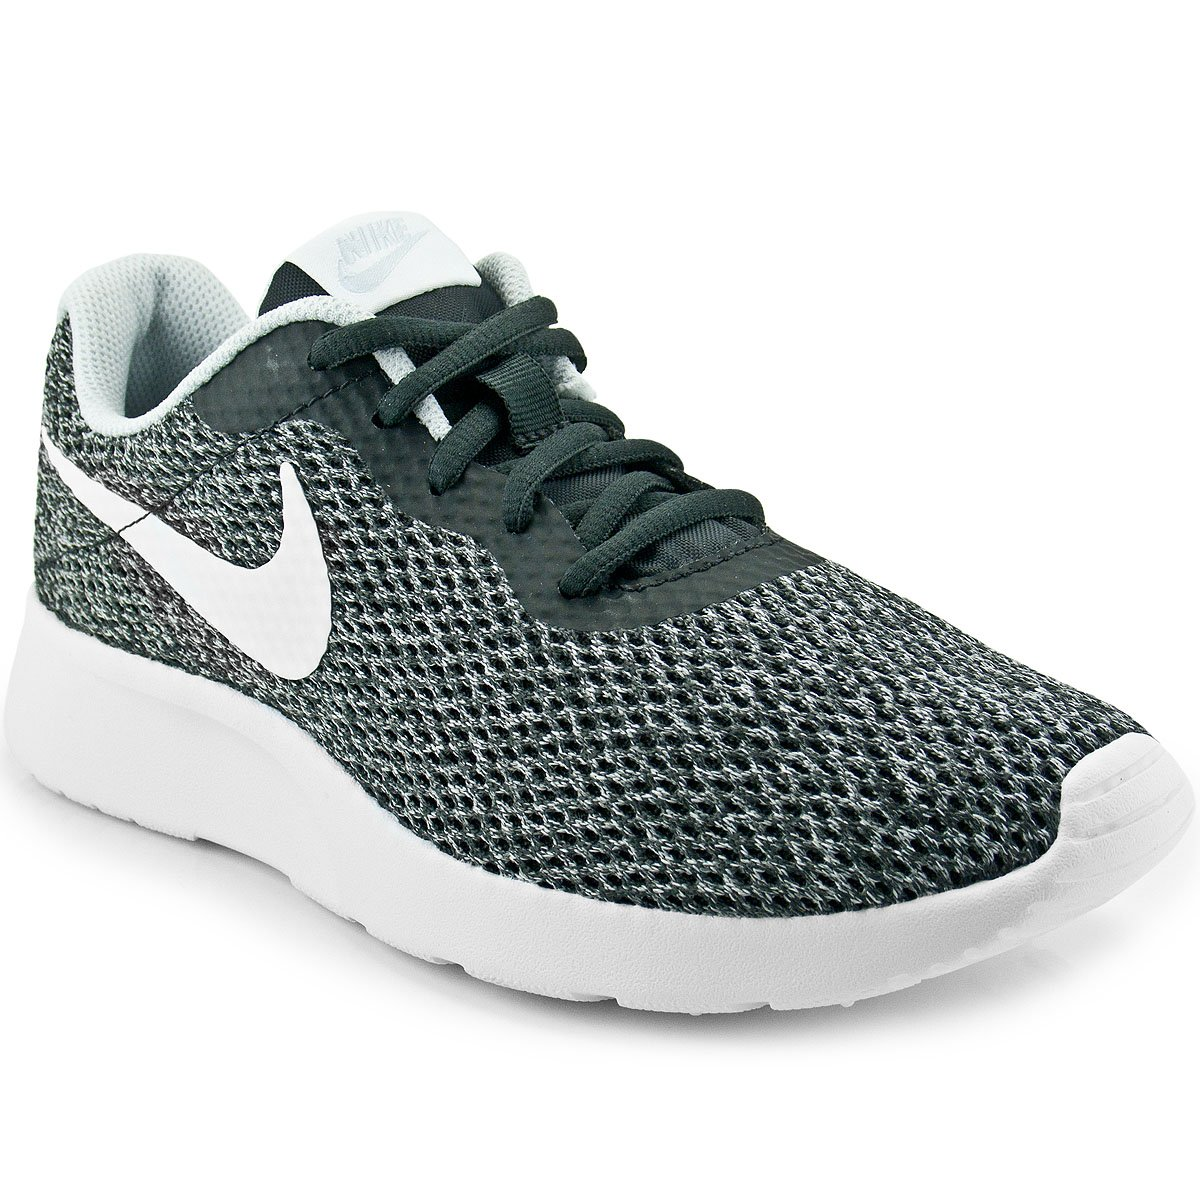 1557a68409 Tênis Nike Tanjun SE Feminino 844908